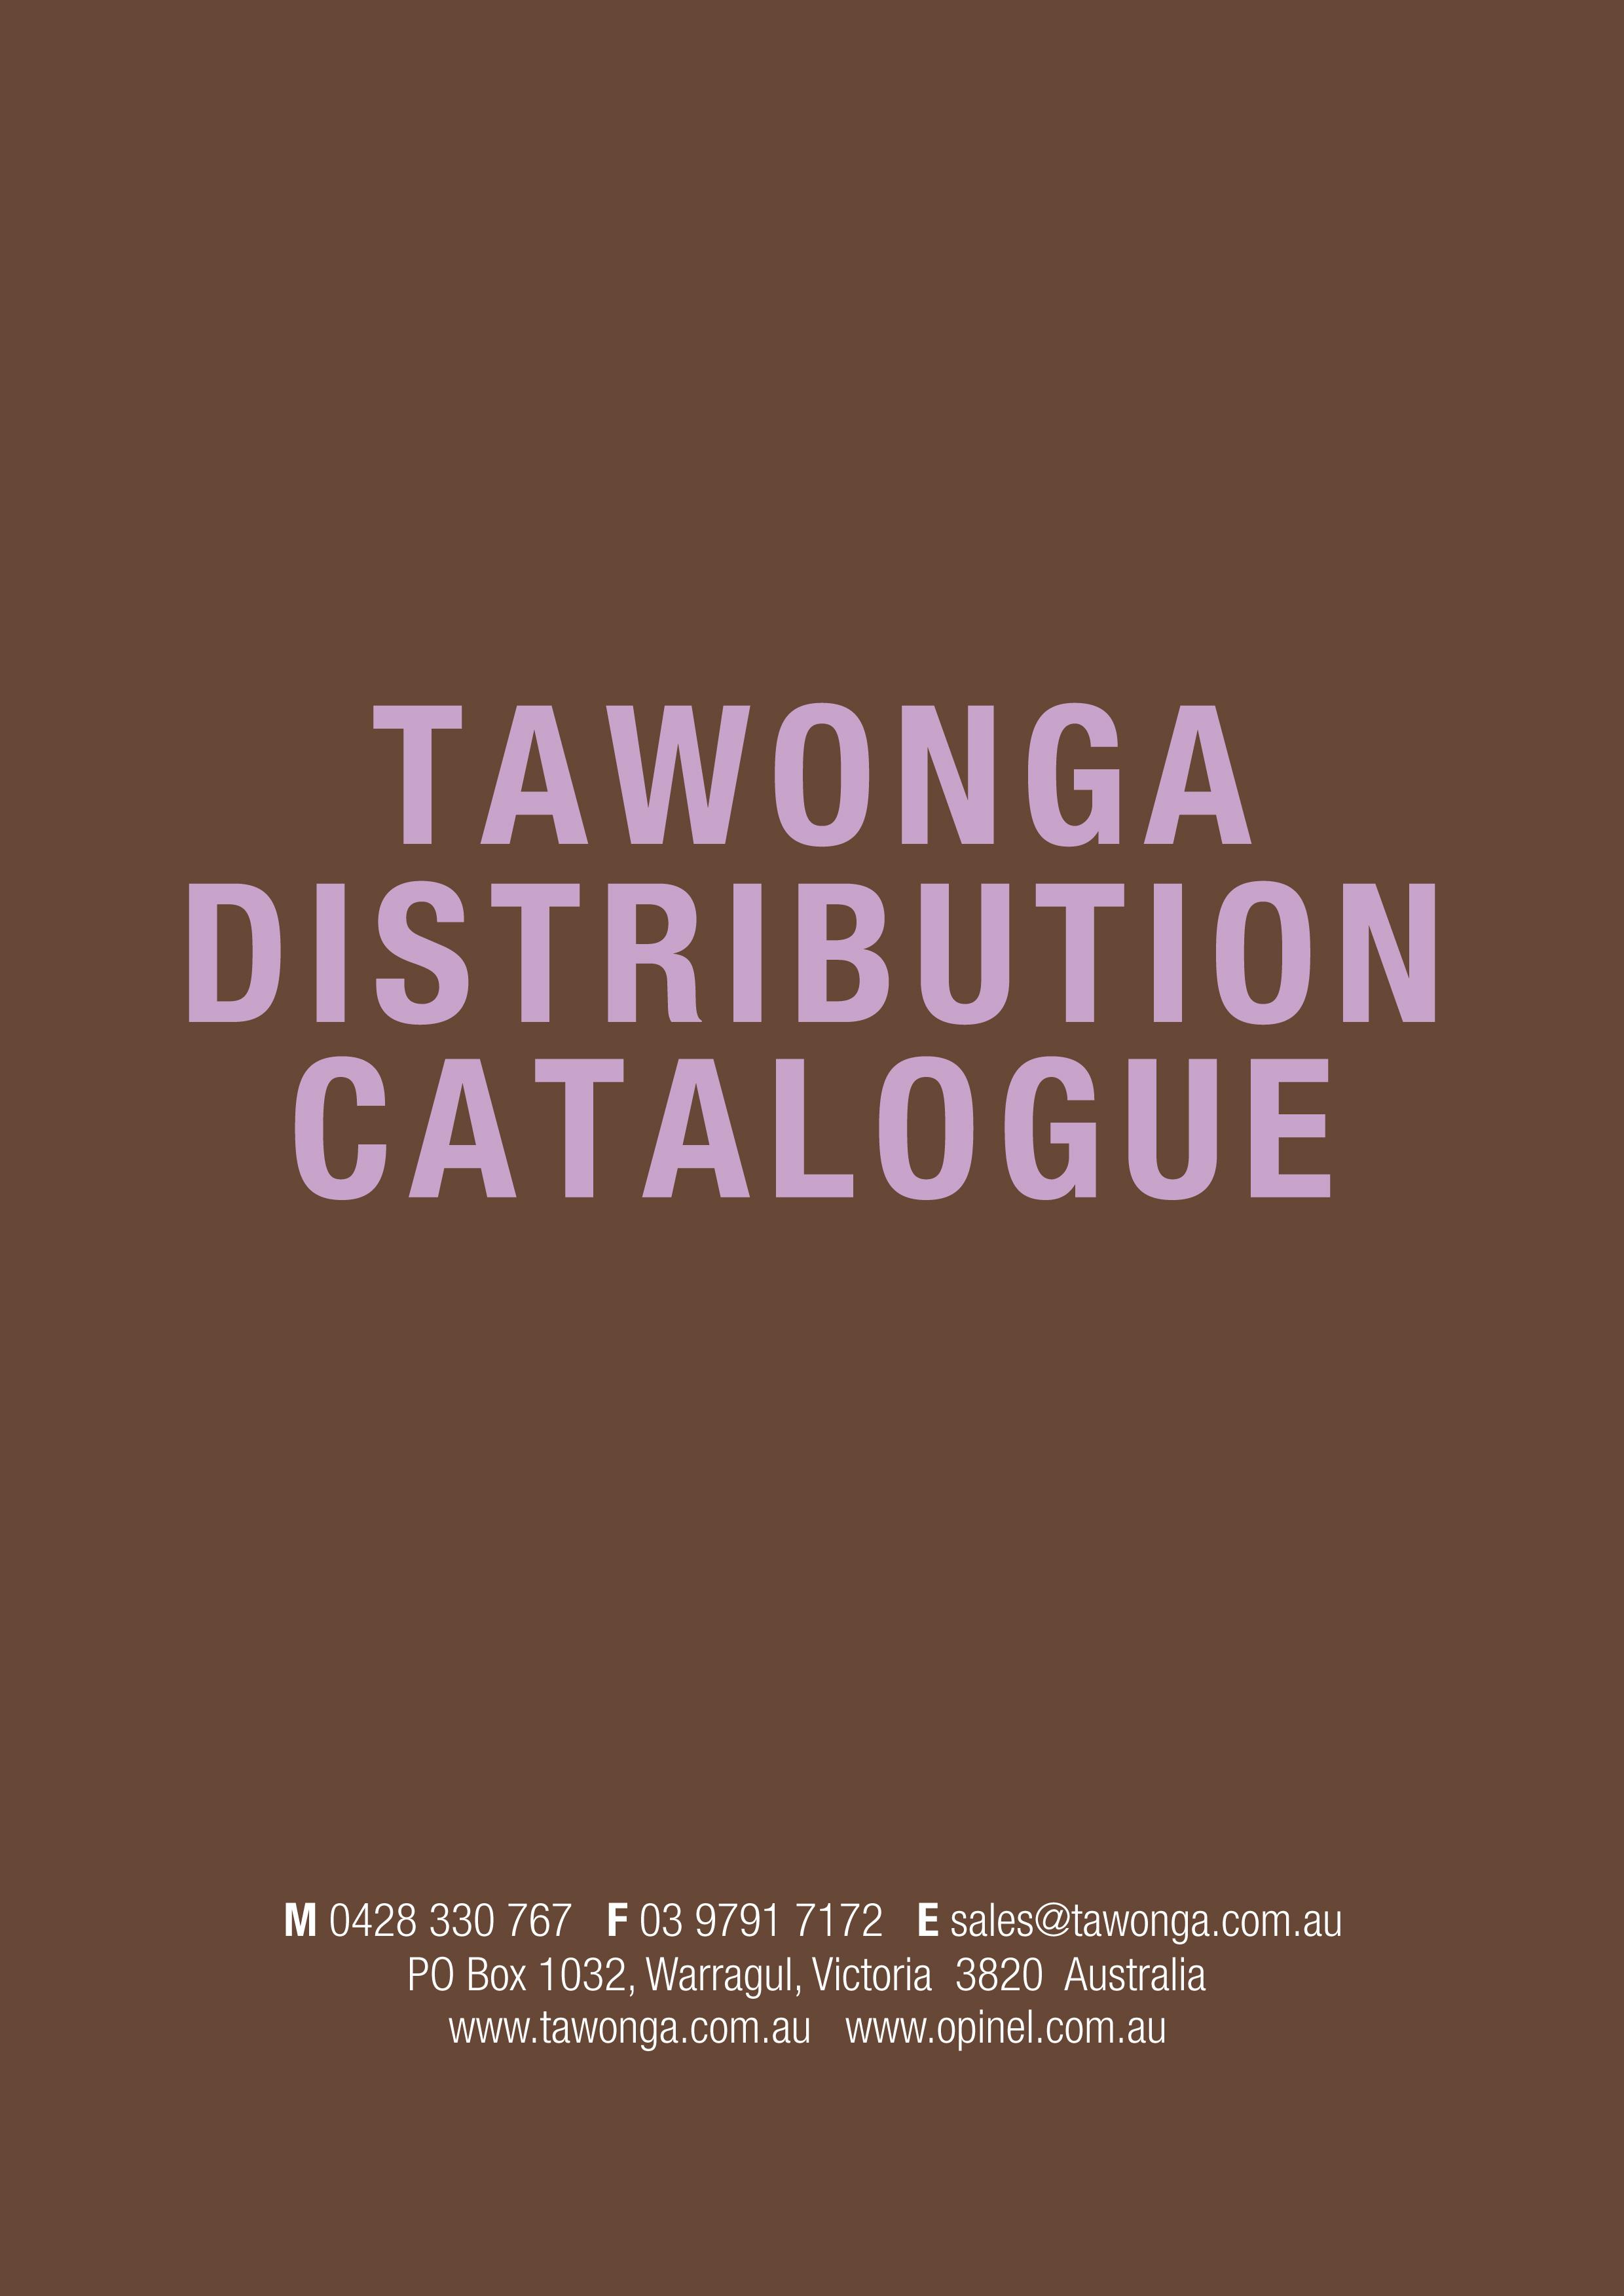 Tawonga 2019 Catalogue cover.jpg